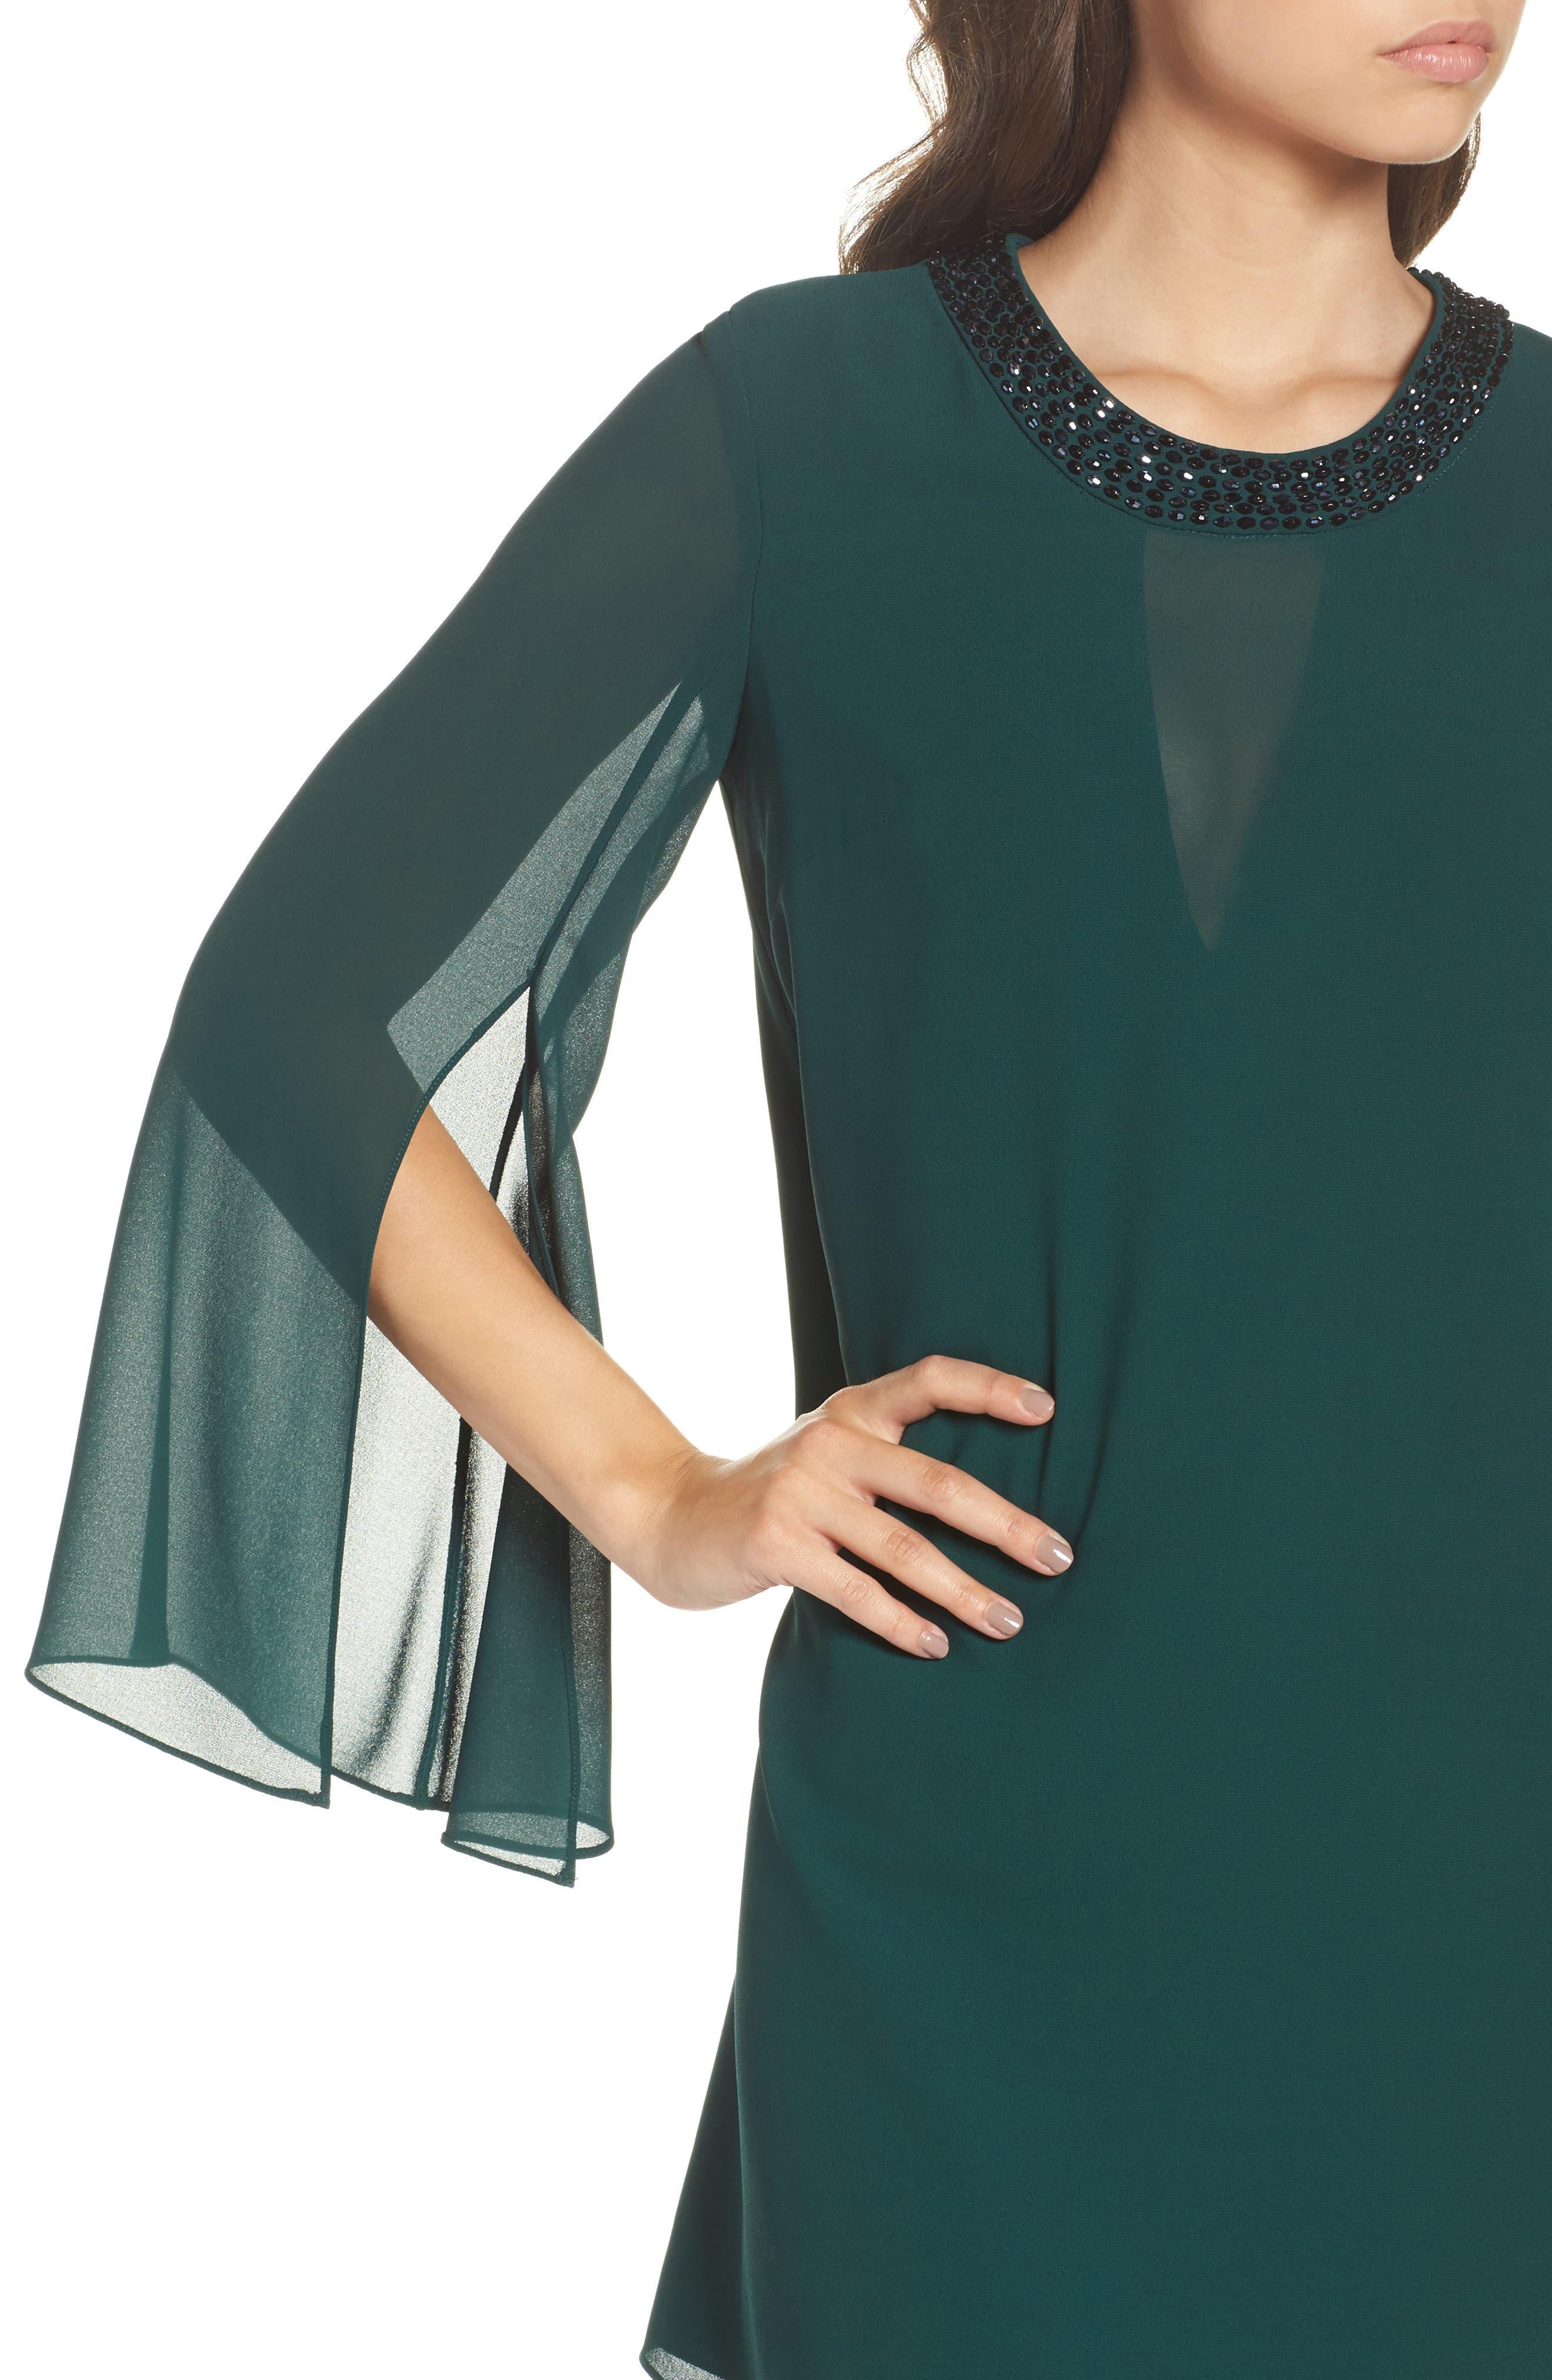 Embellished Chiffon Shift Dress,                             Alternate thumbnail 4, color,                             Hunter